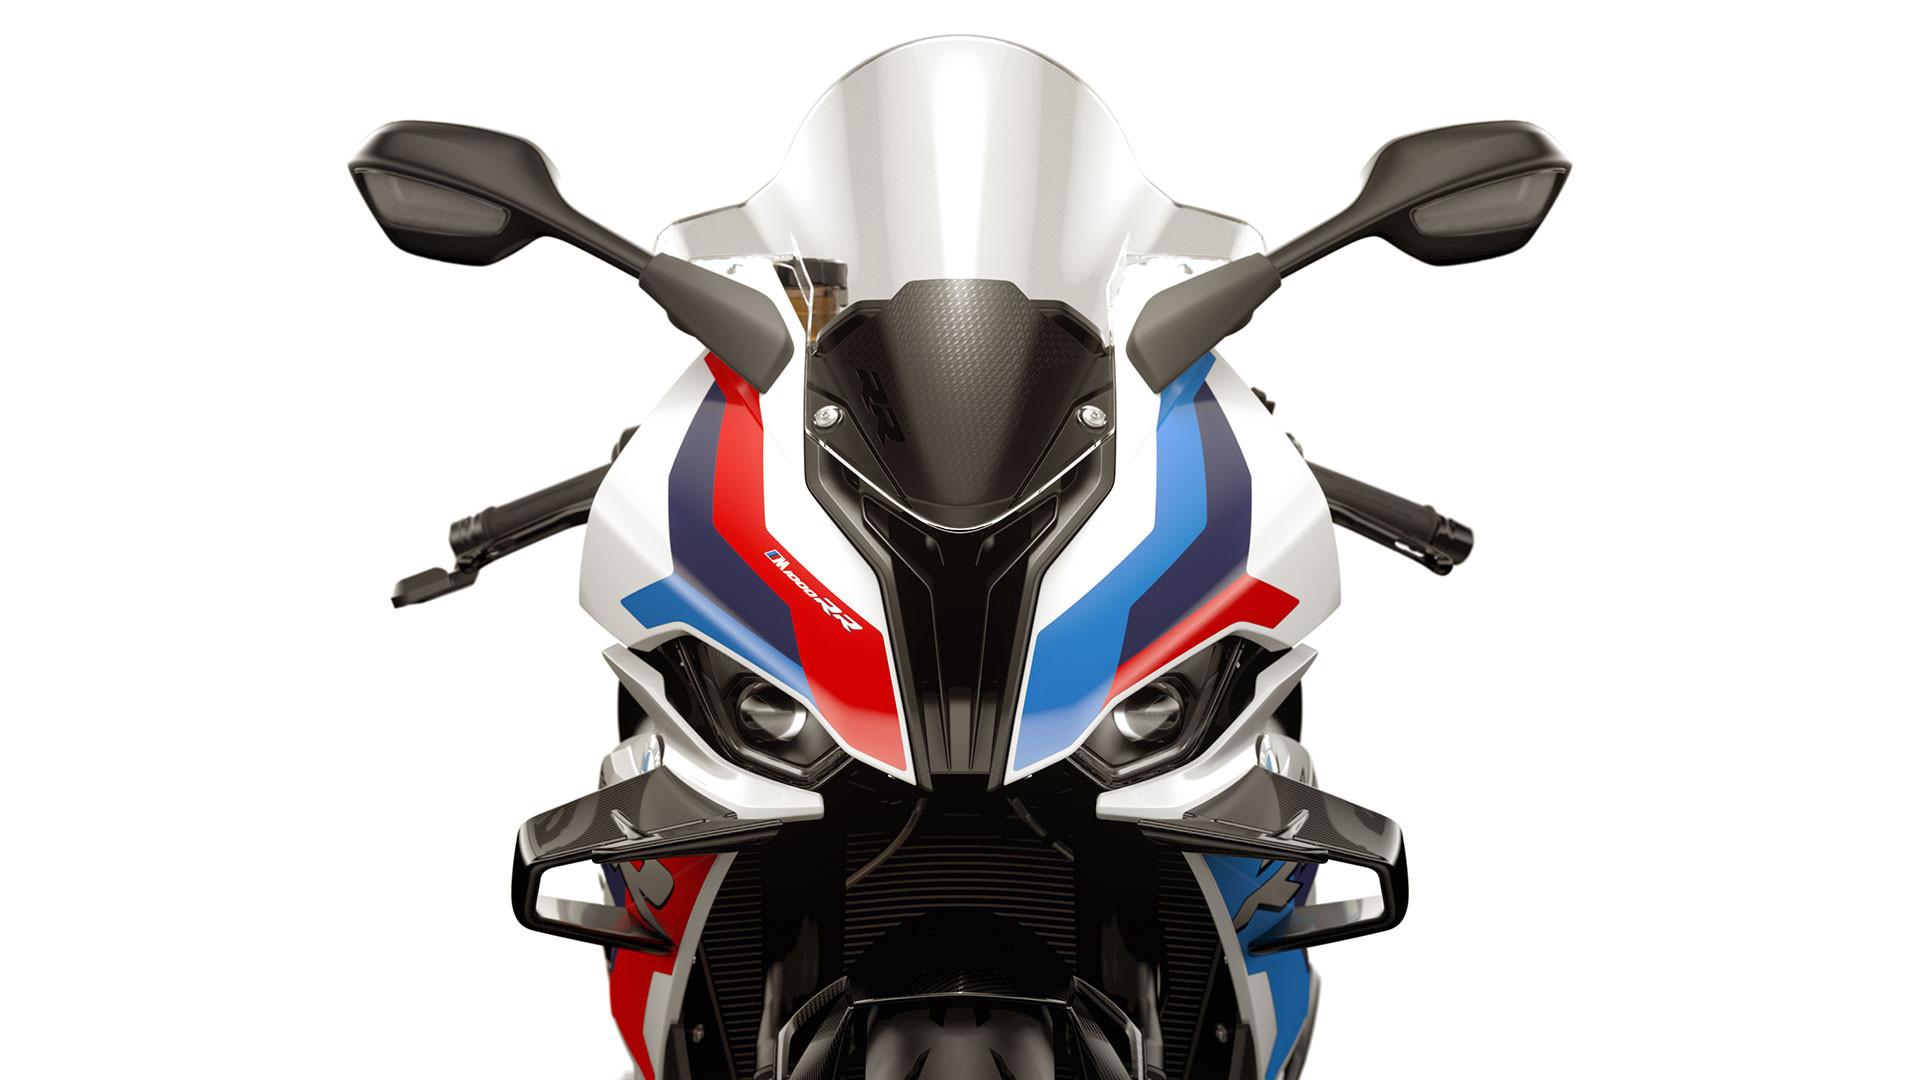 Дизайн – характерный стиль BMW M